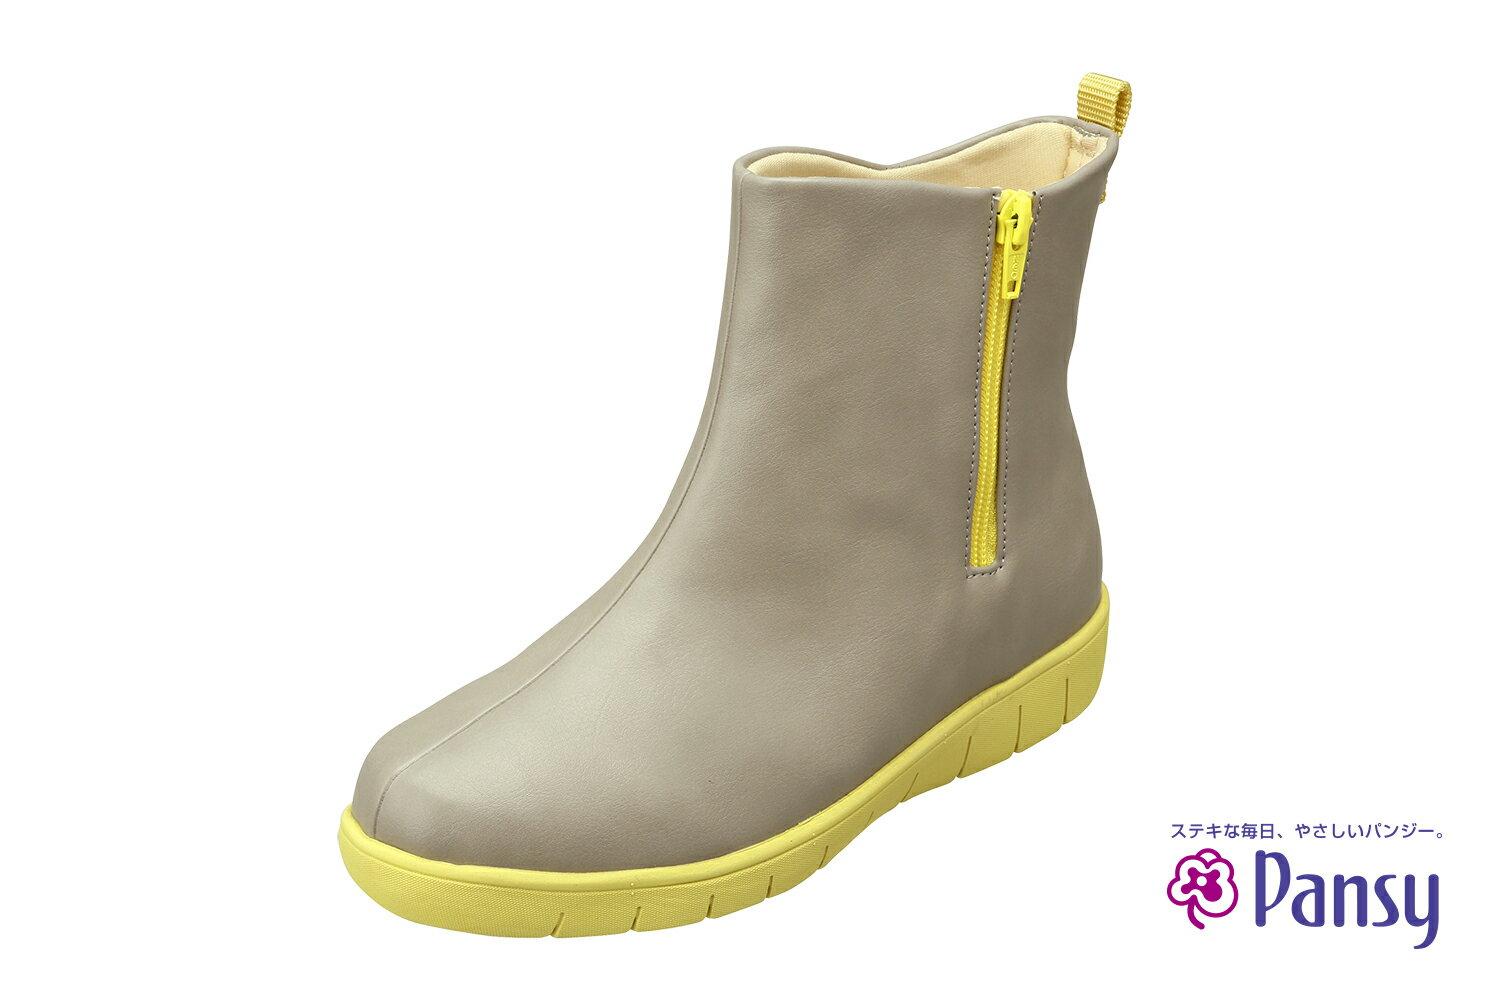 PANSY 女性 時尚撞色 短筒雨鞋 QA4944 8